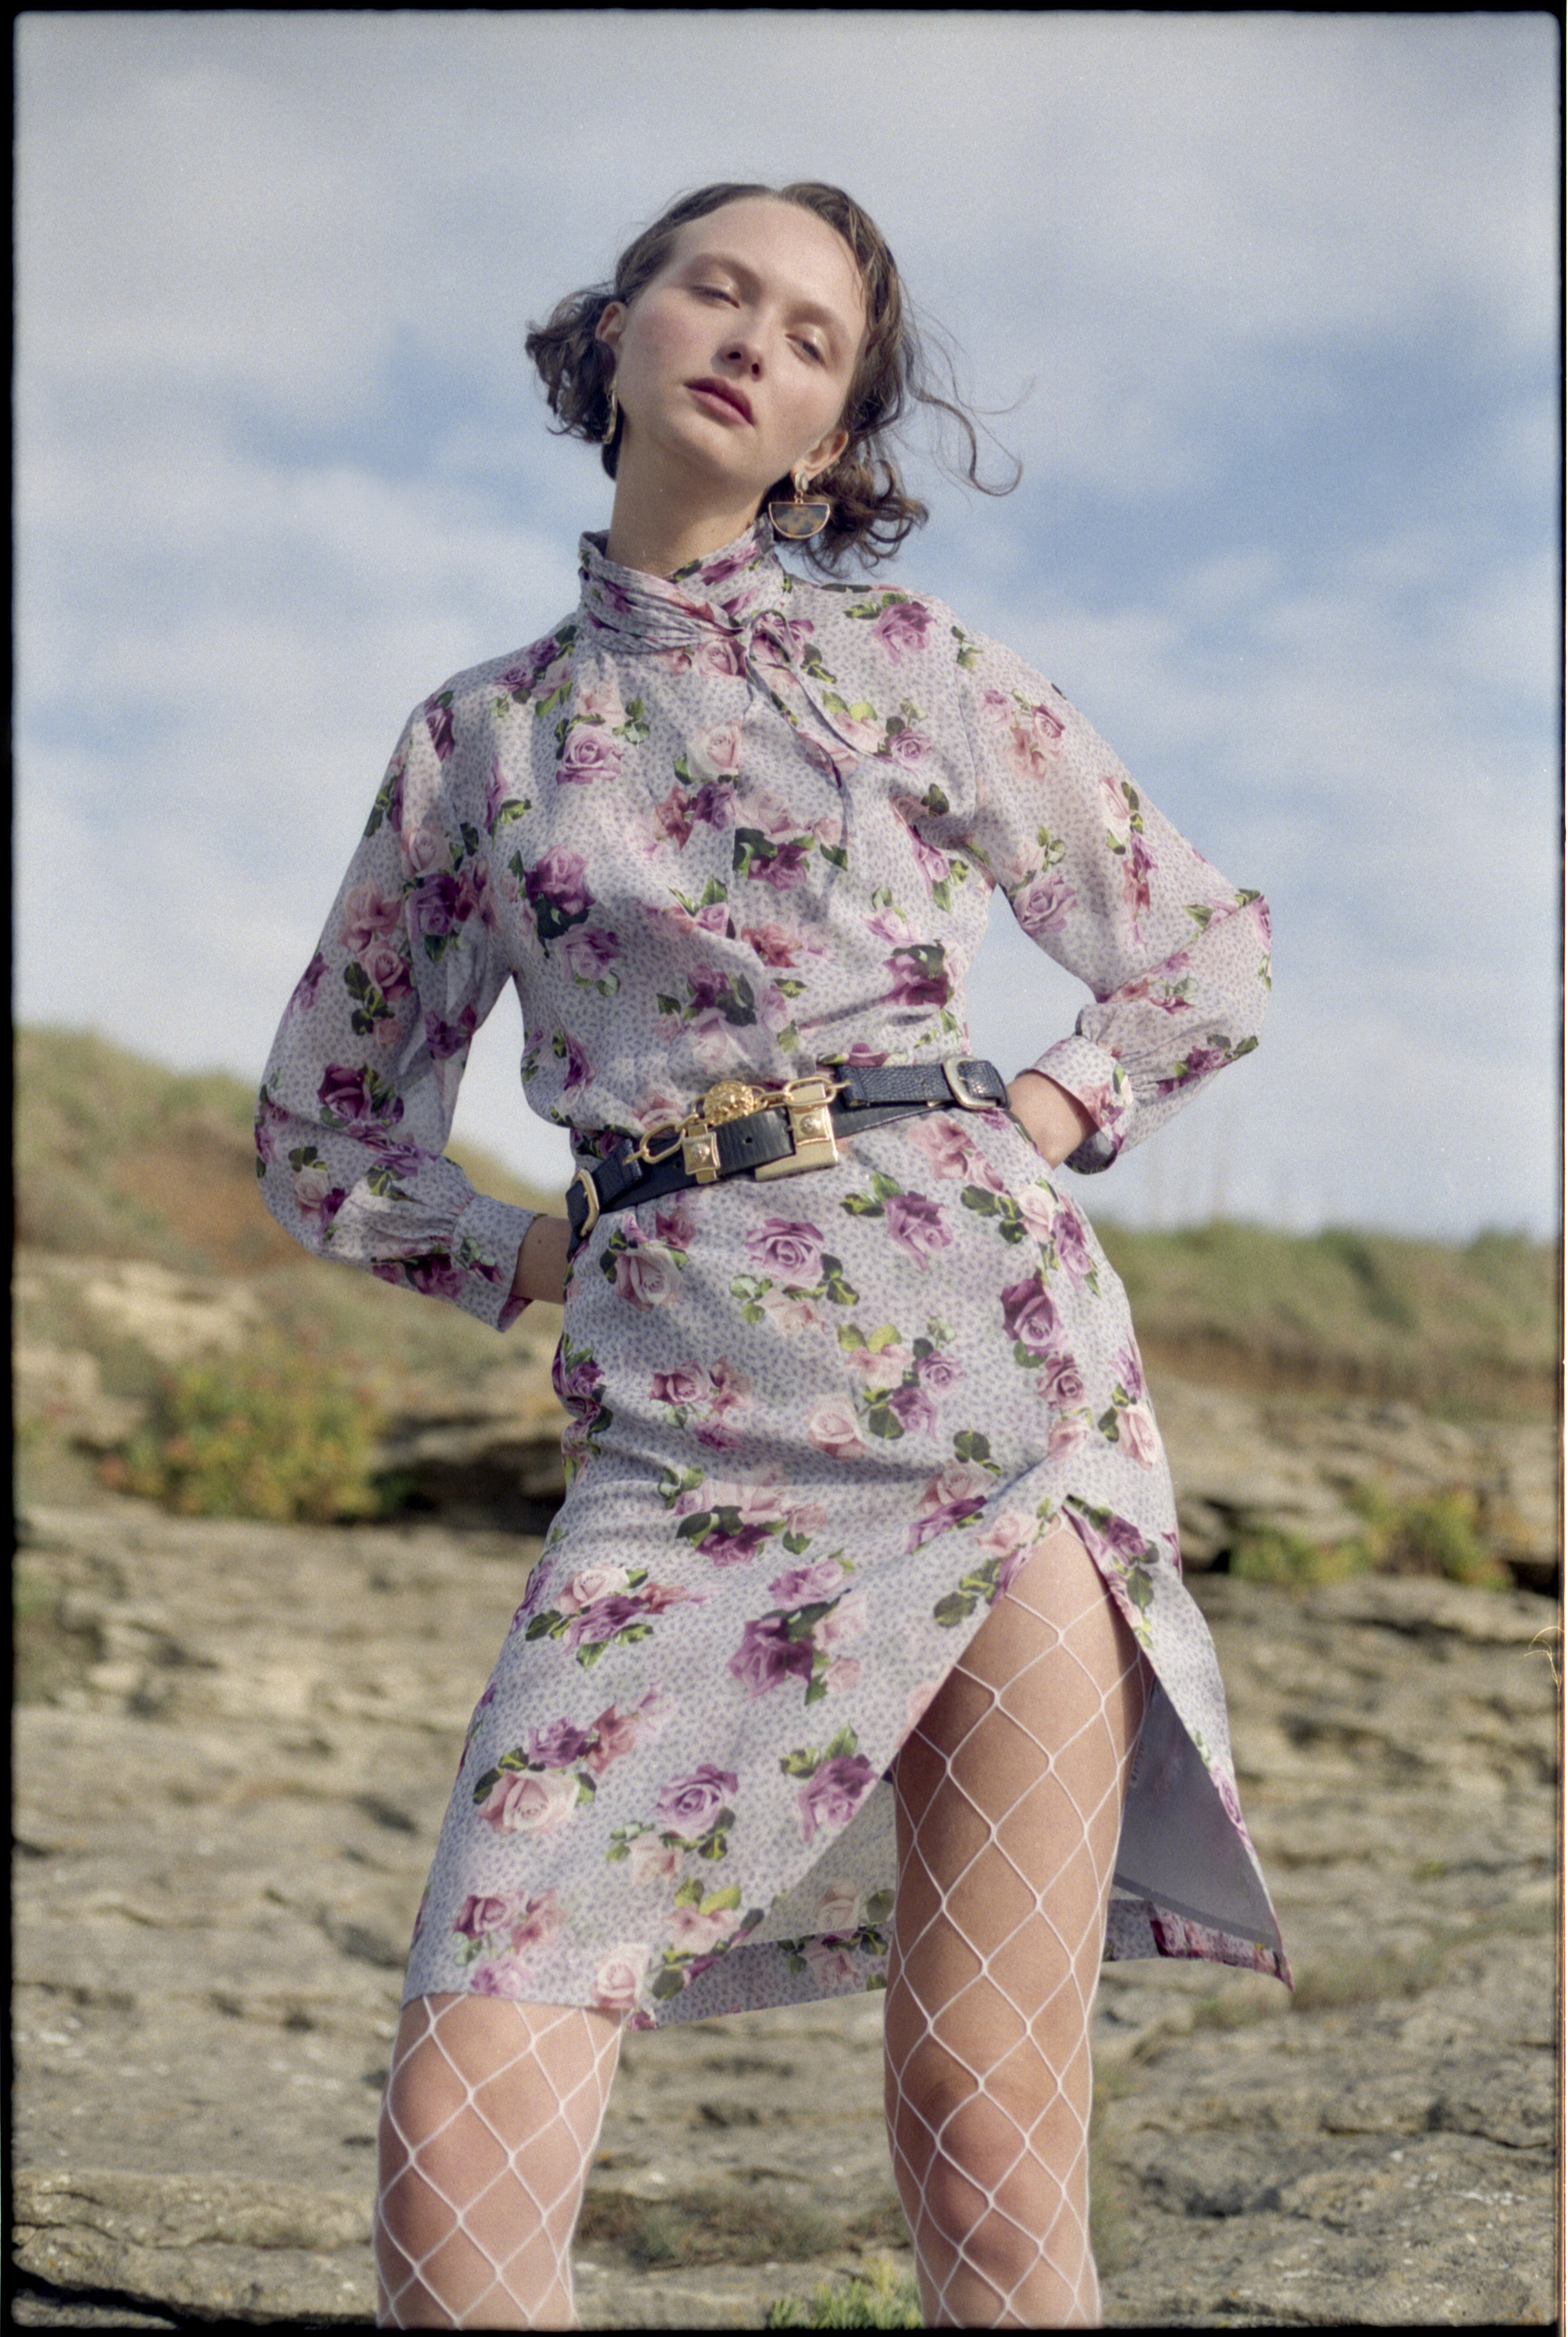 dress  TOPSHOP UNIQUE , belts VINTAGE, earrings  TOPSHOP , fishnet tights STYLIST'S OWN